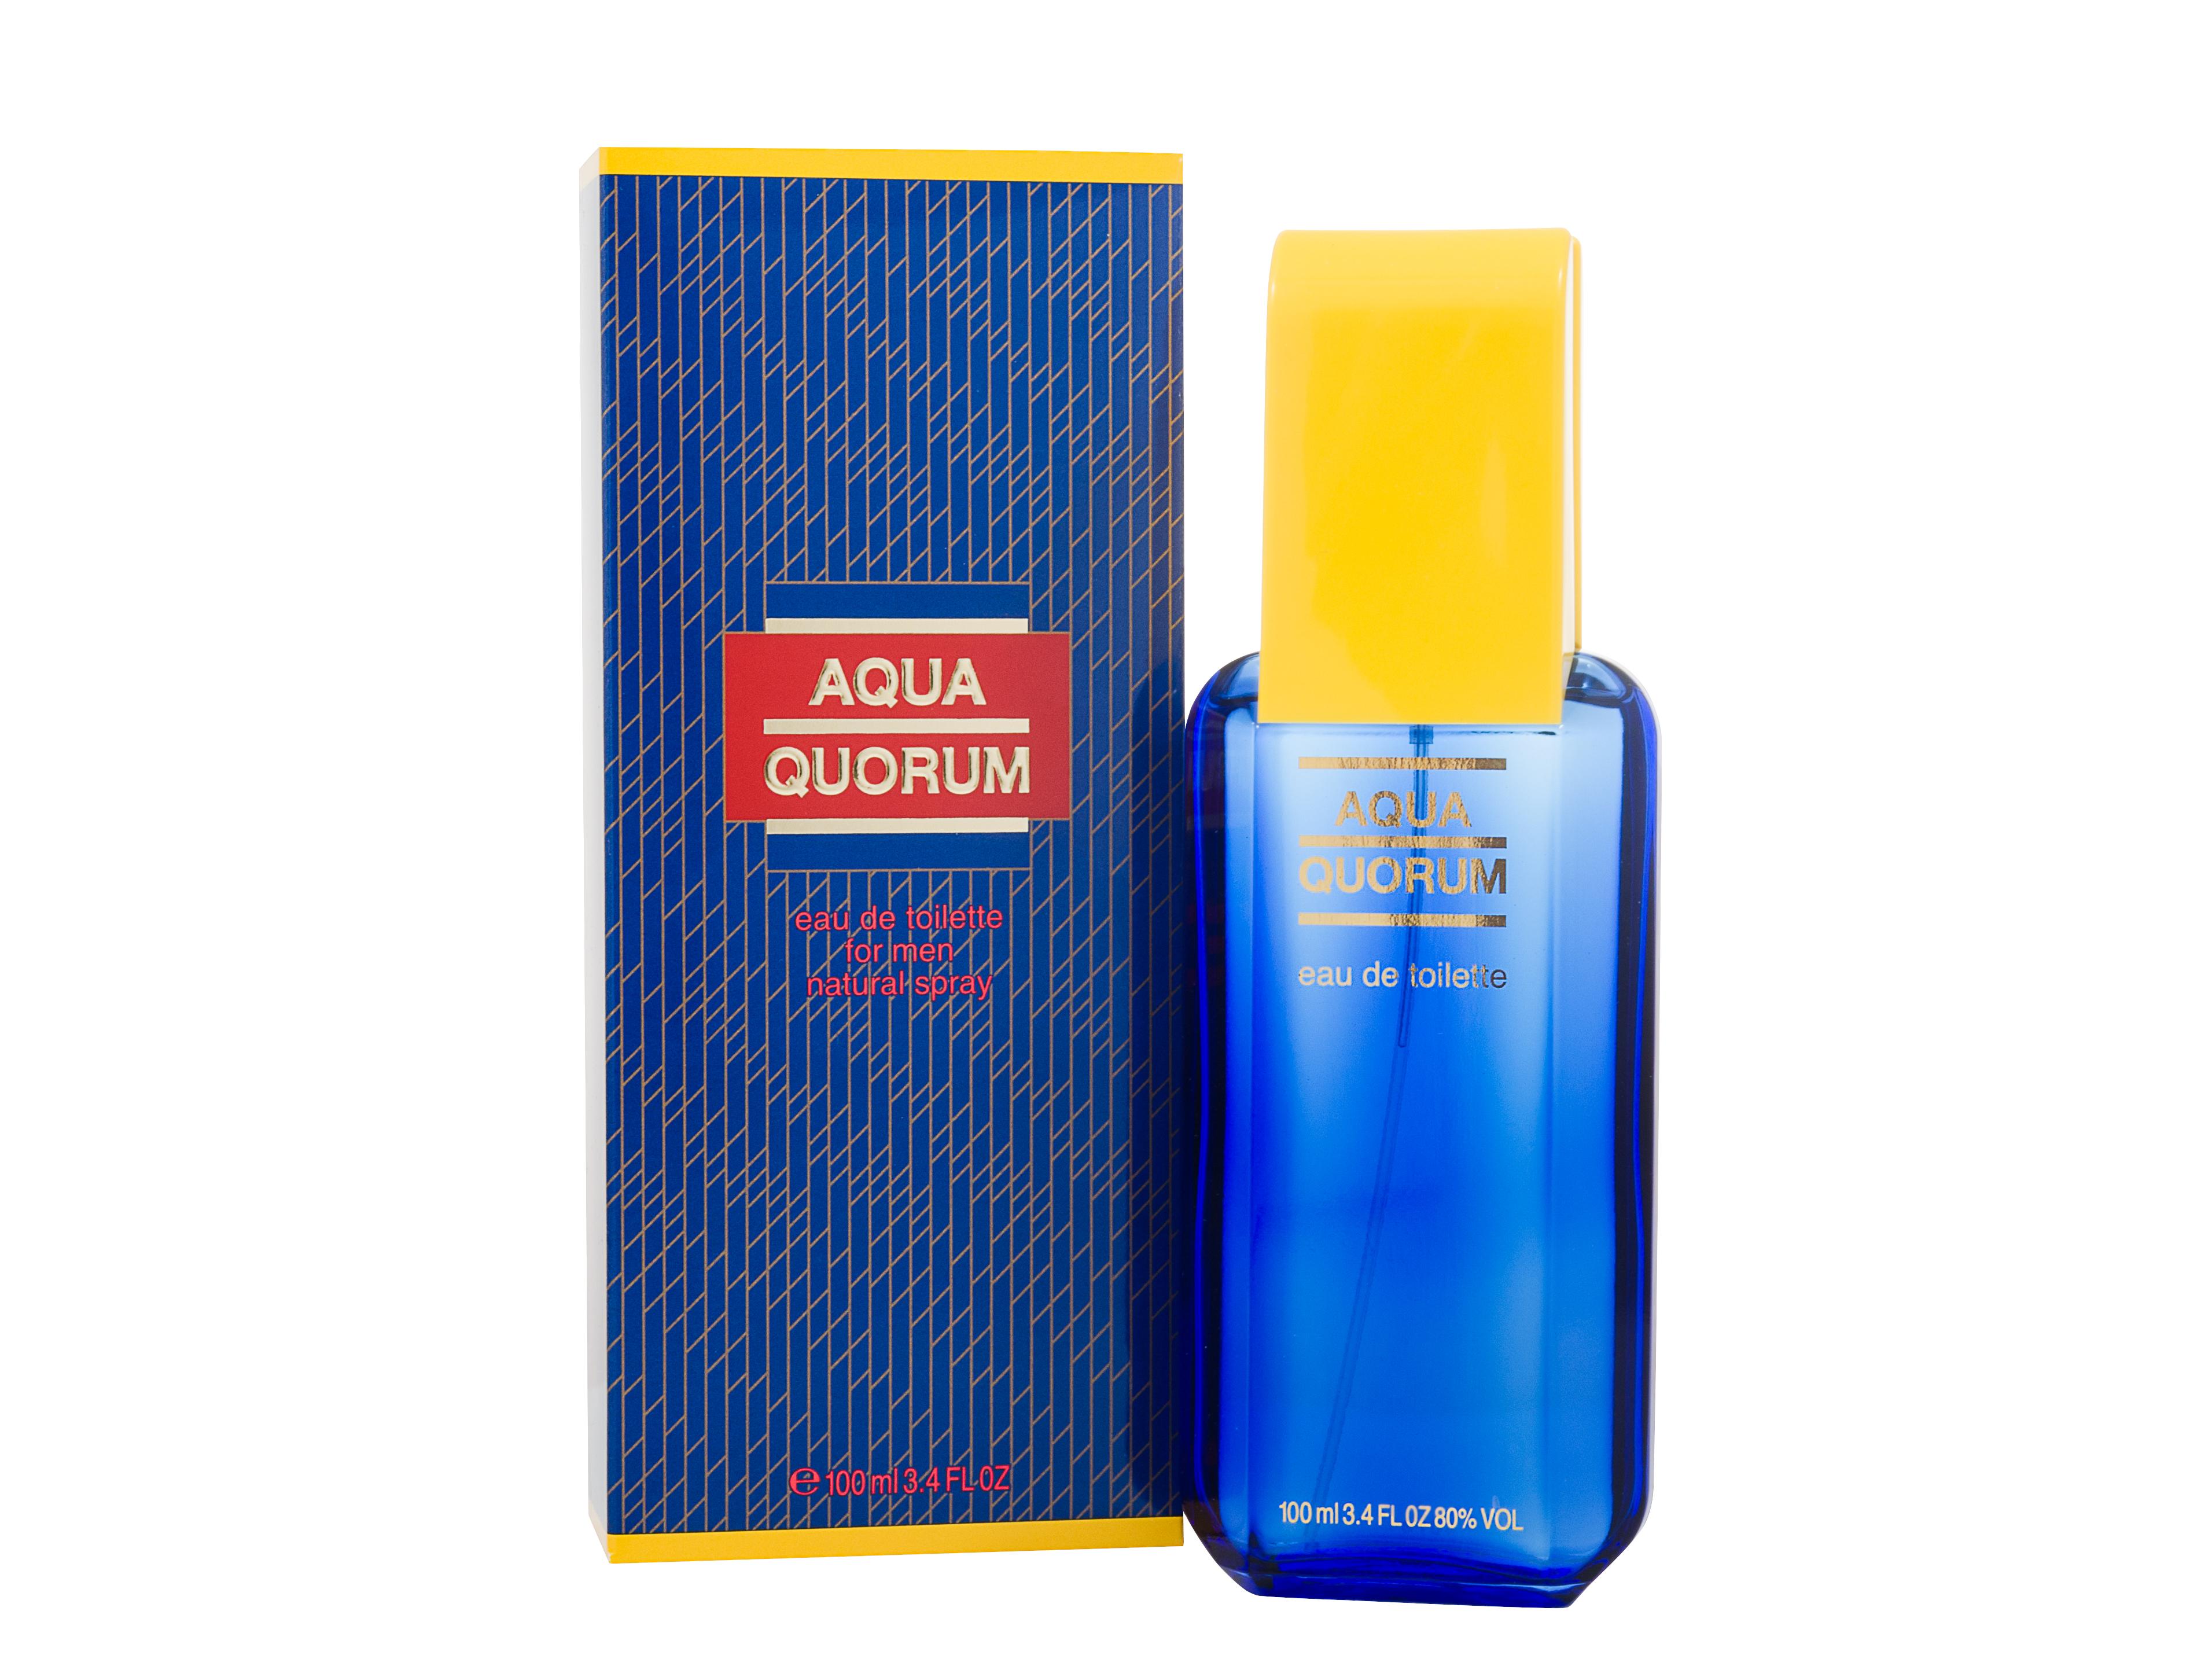 Puig Aqua Quorum Eau de Toilette 100ml